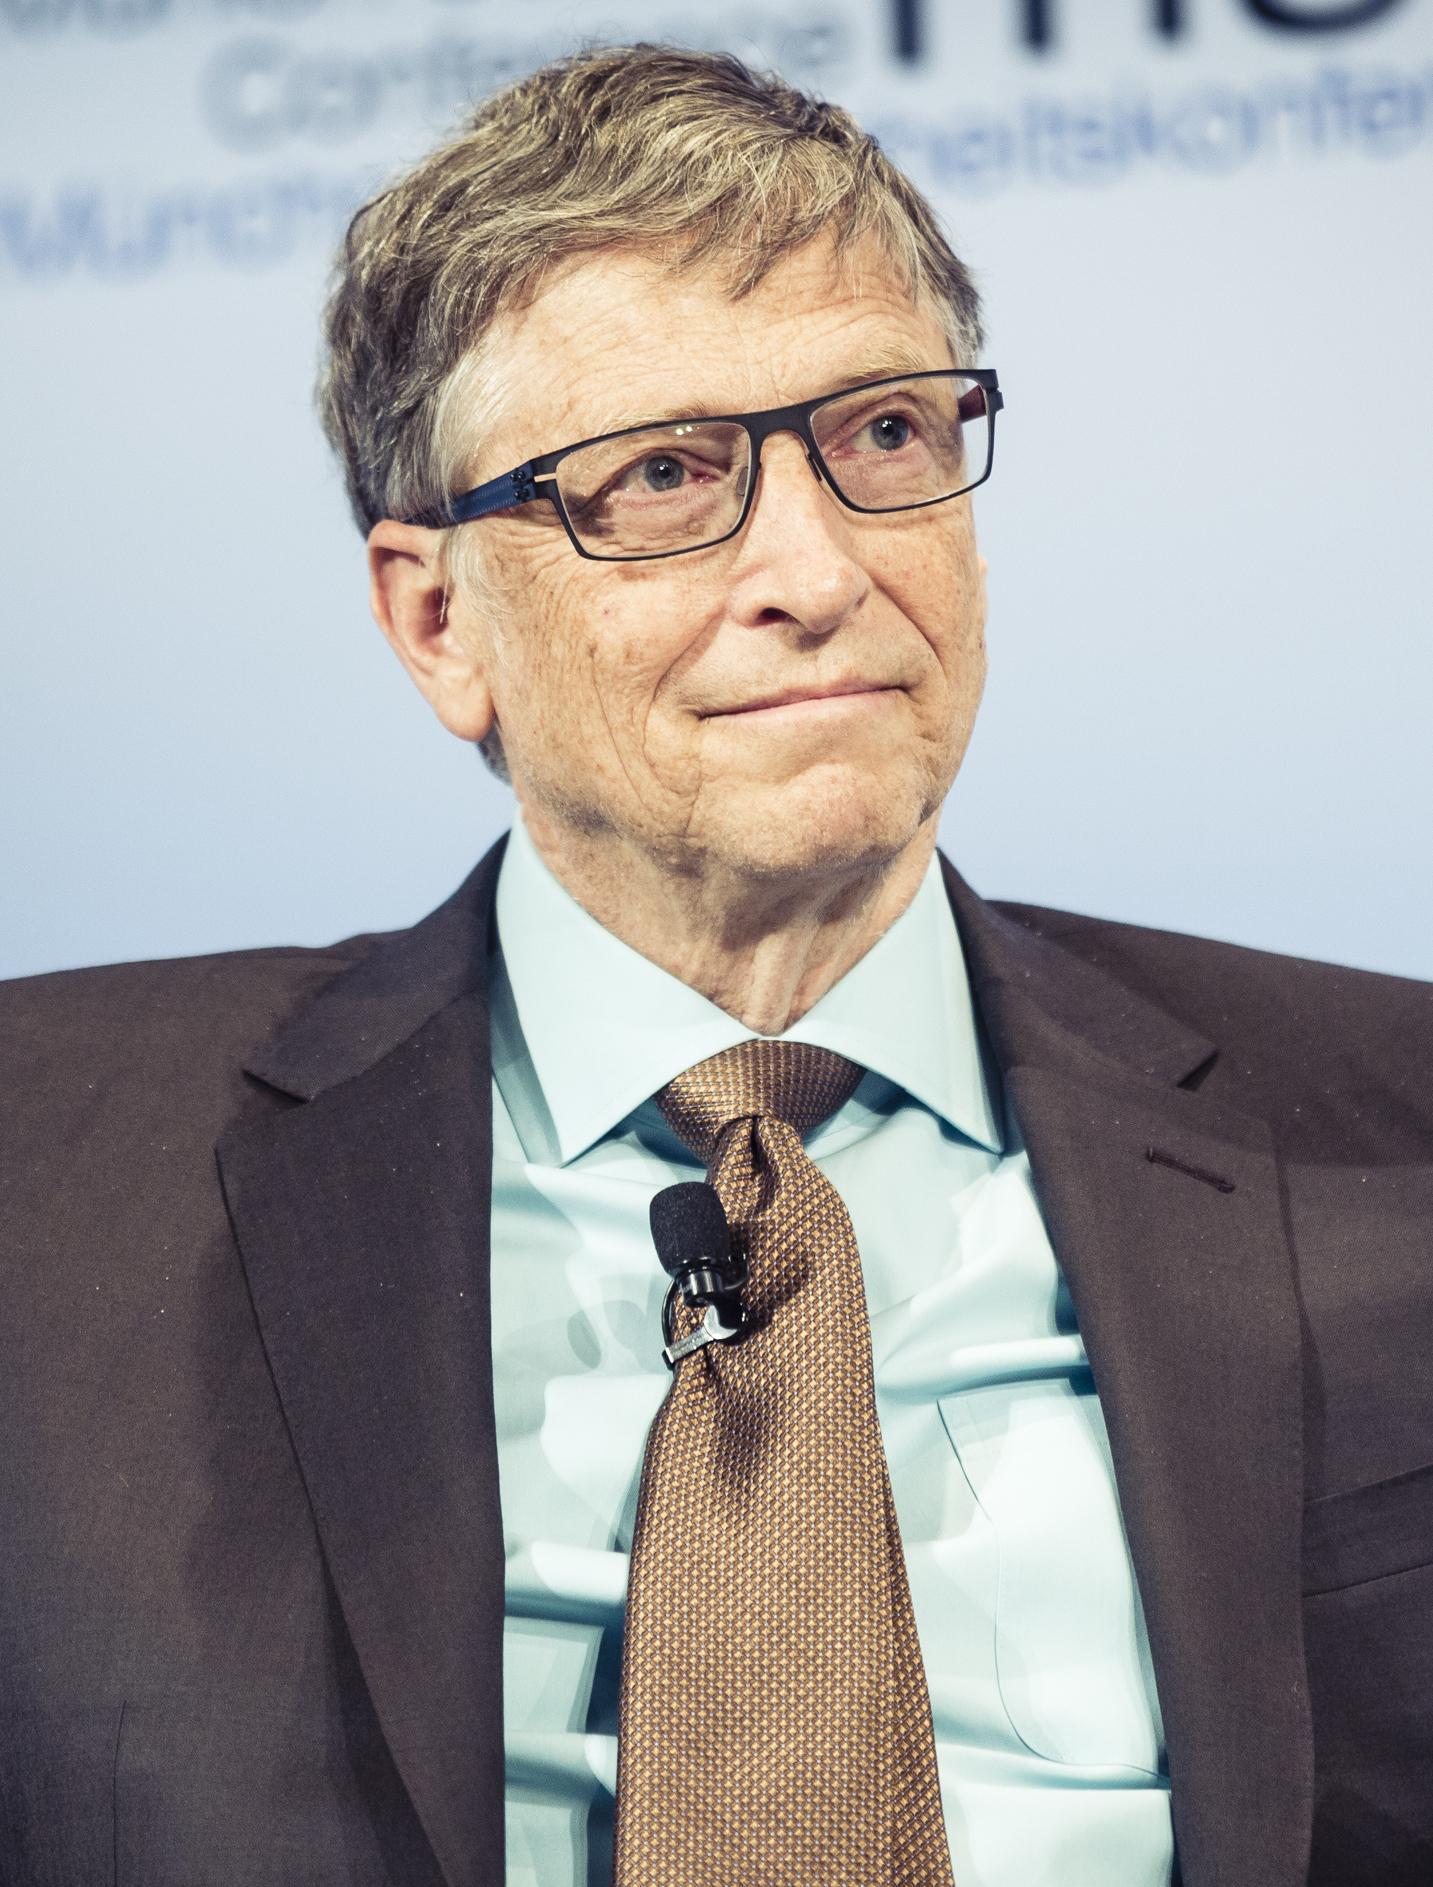 File:Bill Gates MSC 2017 (cropped).jpg - Wikimedia Commons